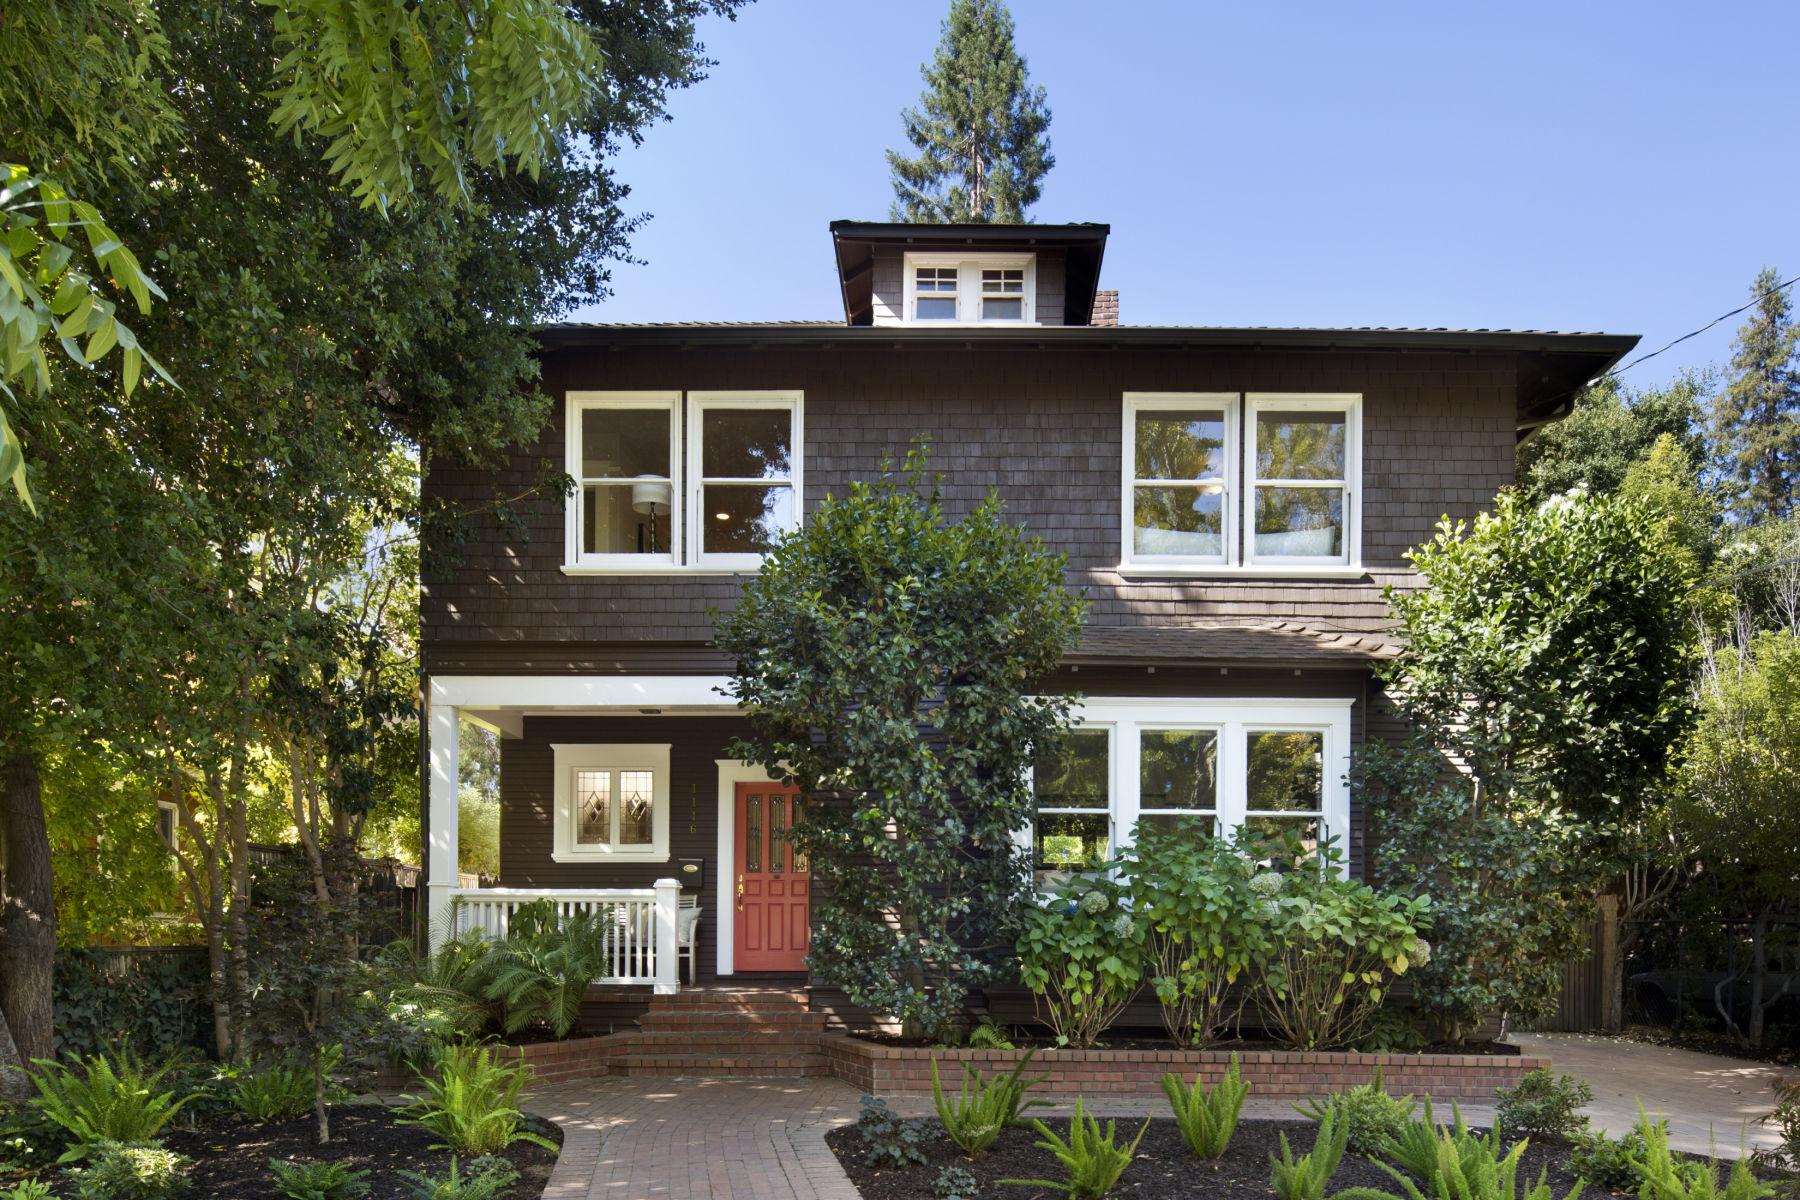 Single Family Home for Sale at Professorville 1116 Ramona Street Professorville, Palo Alto, California 94301 United States